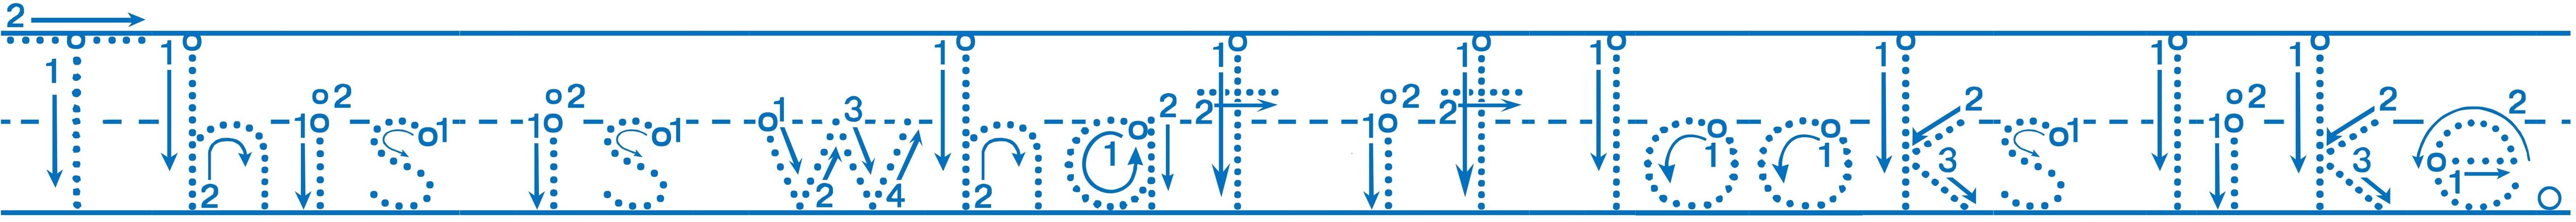 Alphabet Tracing Font for Kids   Free Alphabet Font Sample